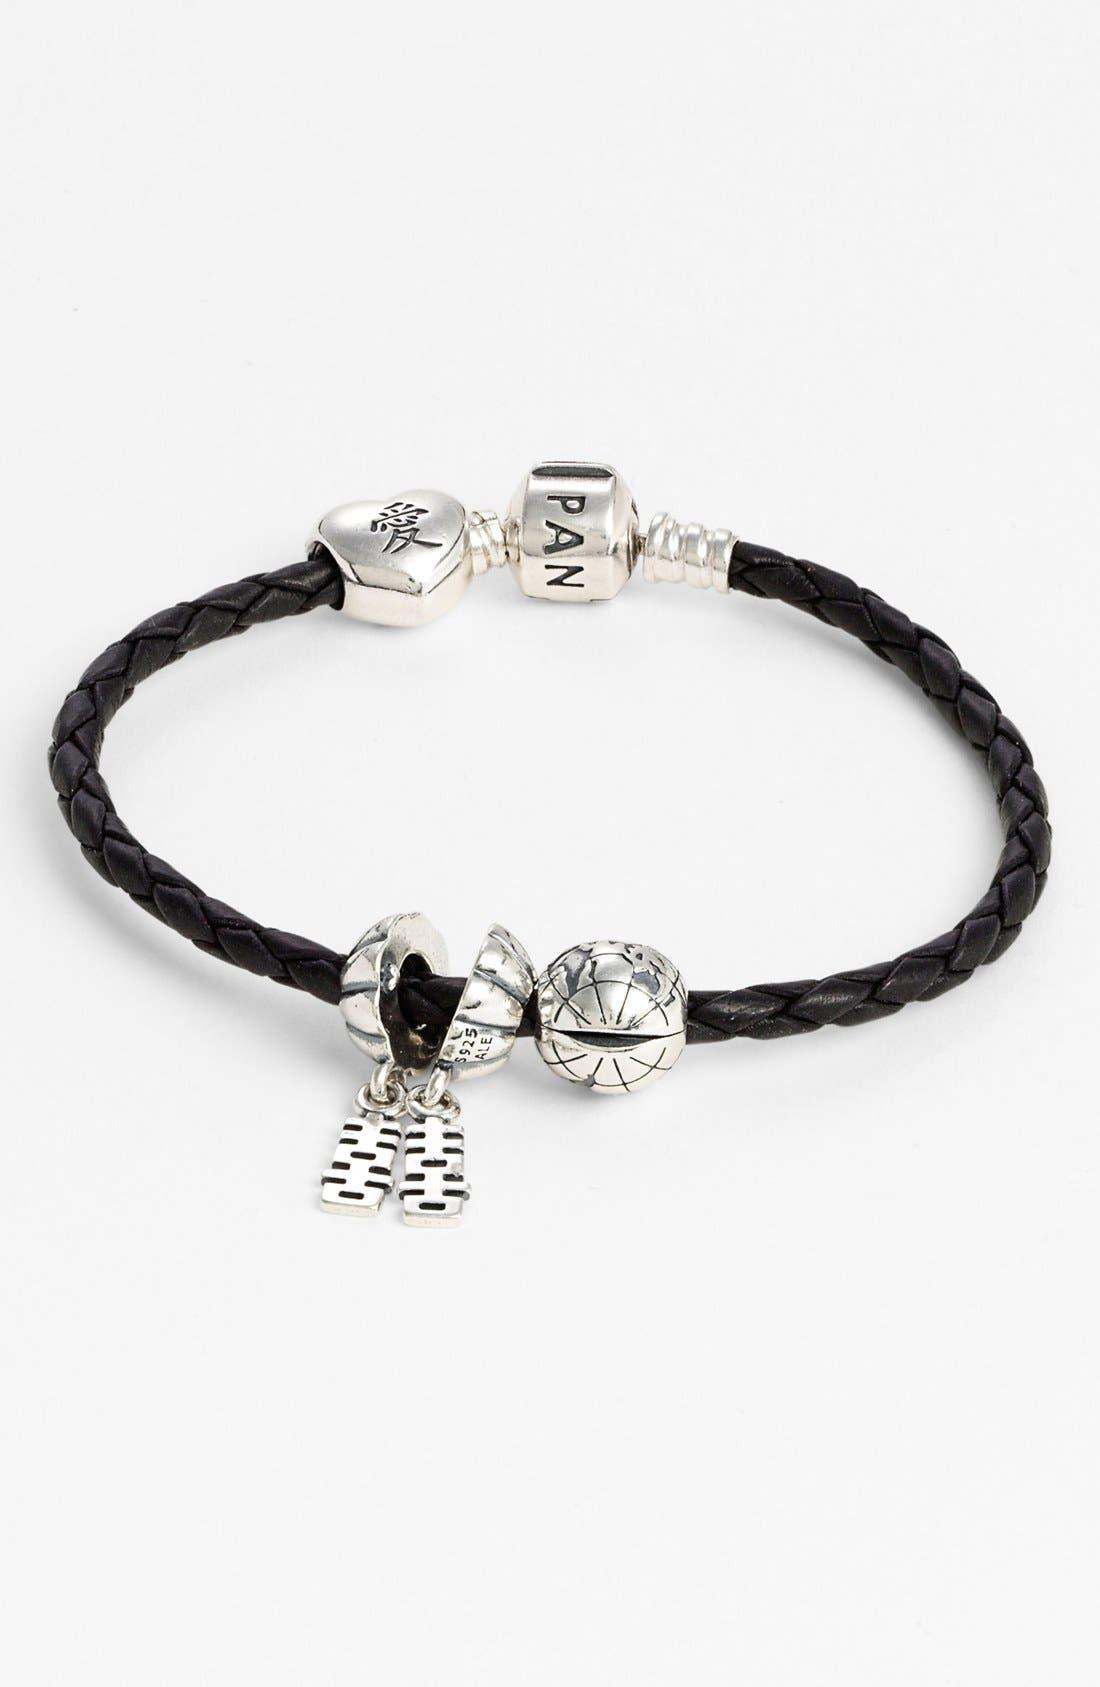 Main Image - PANDORA Woven Leather Charm Bracelet